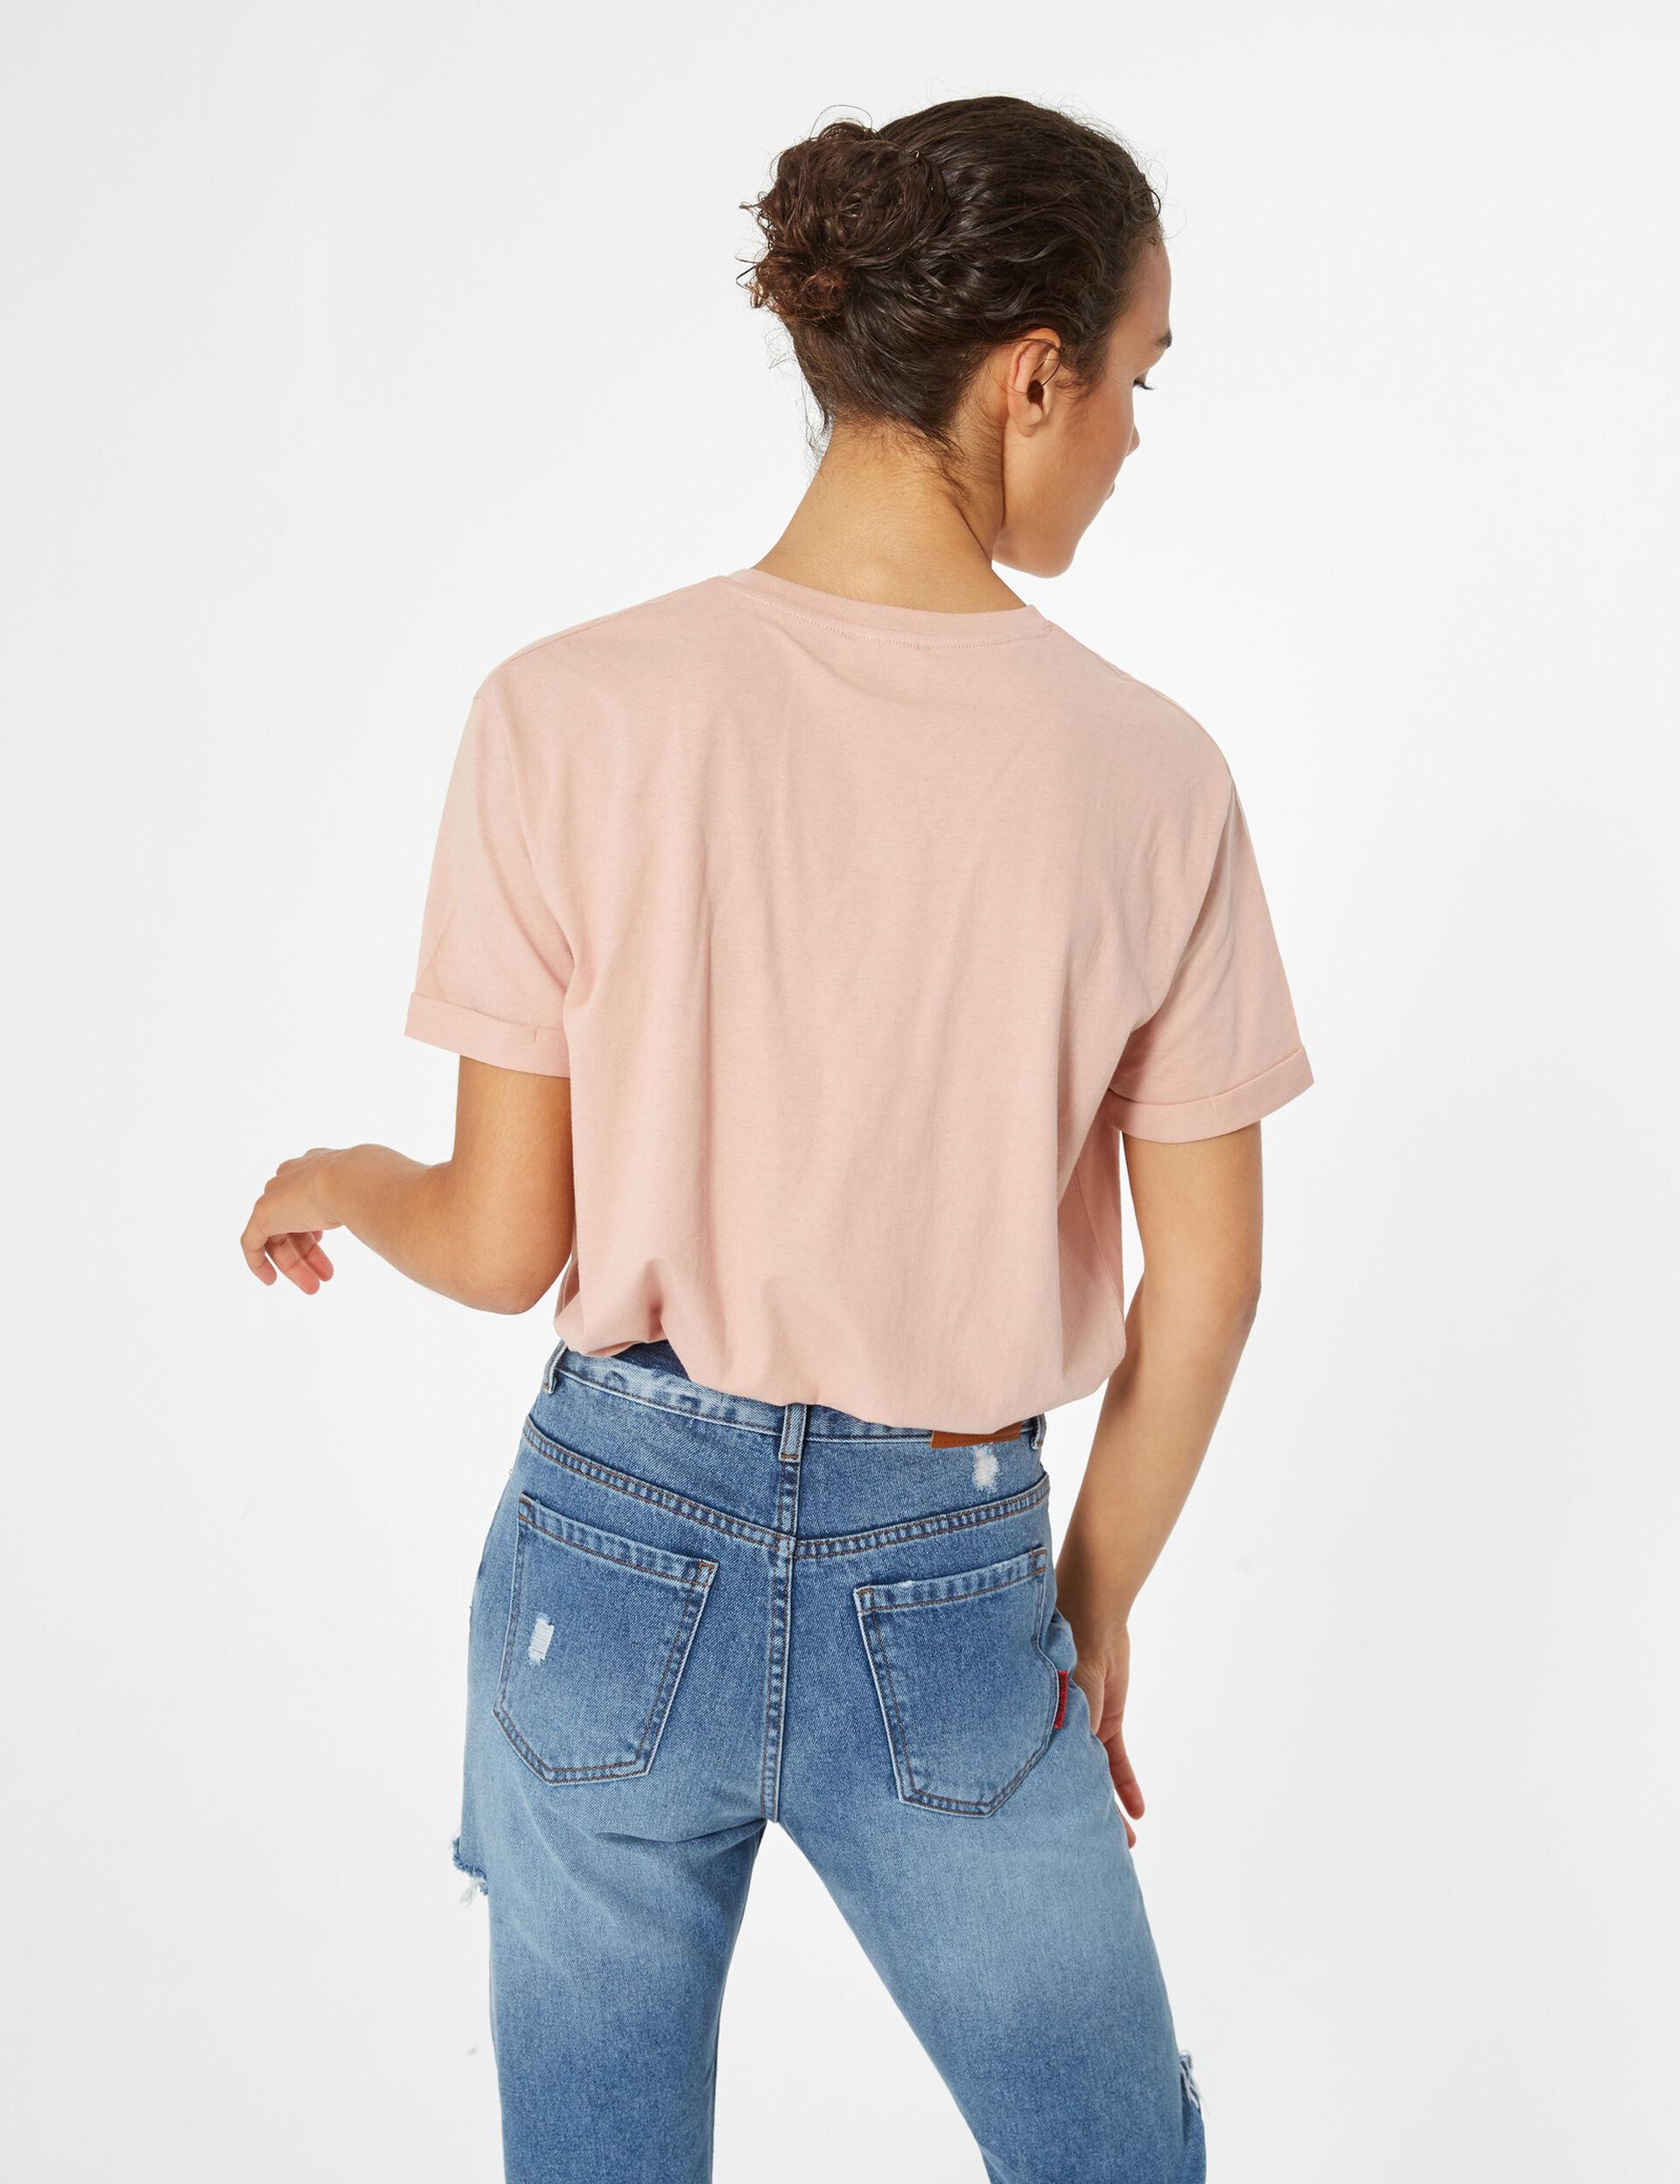 Classy t-shirt